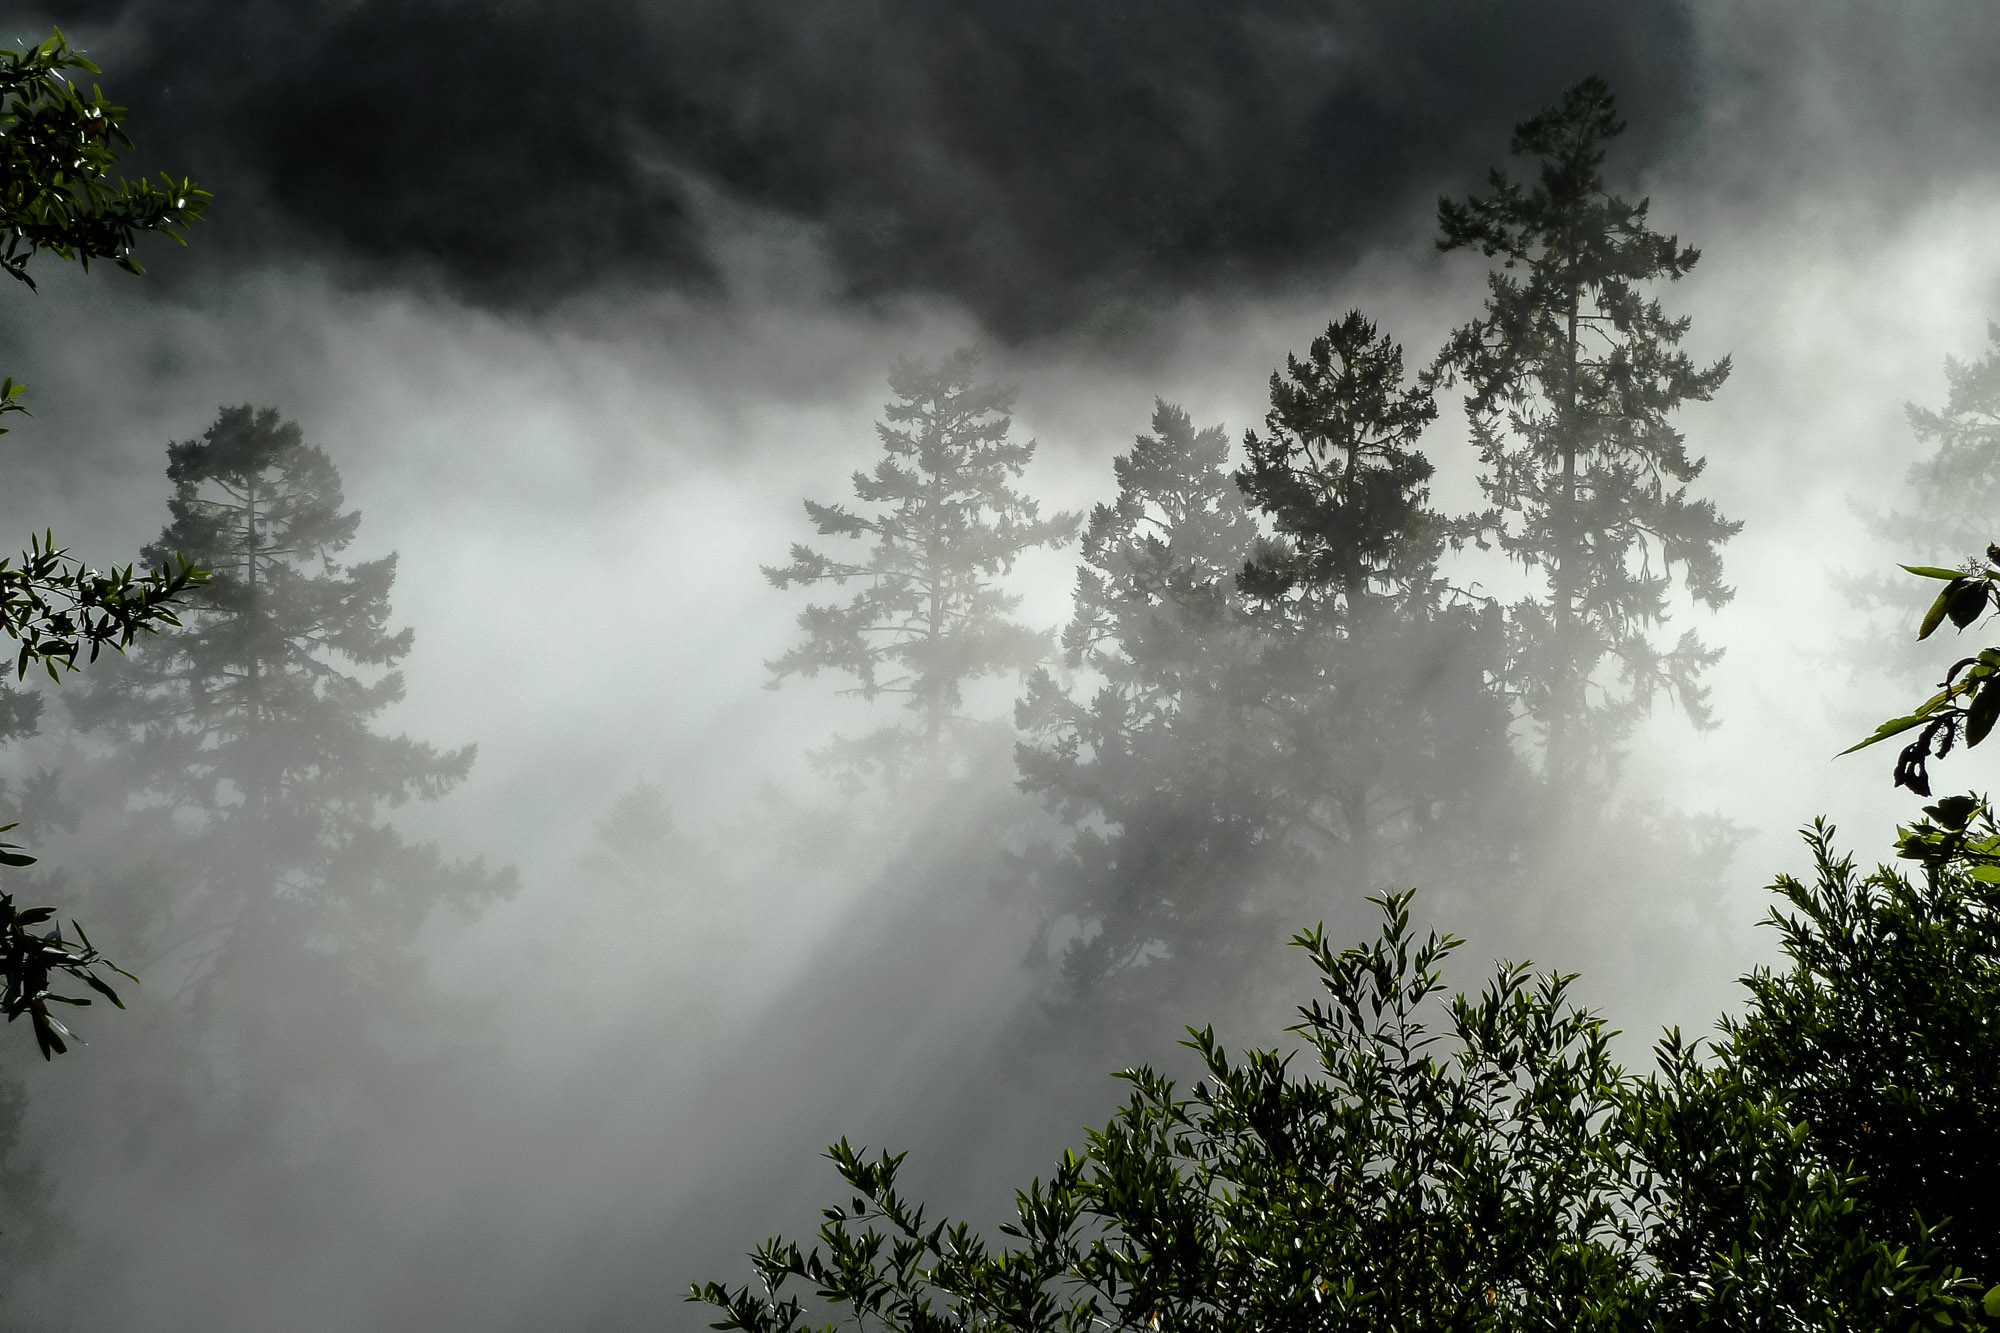 morning fog and sun